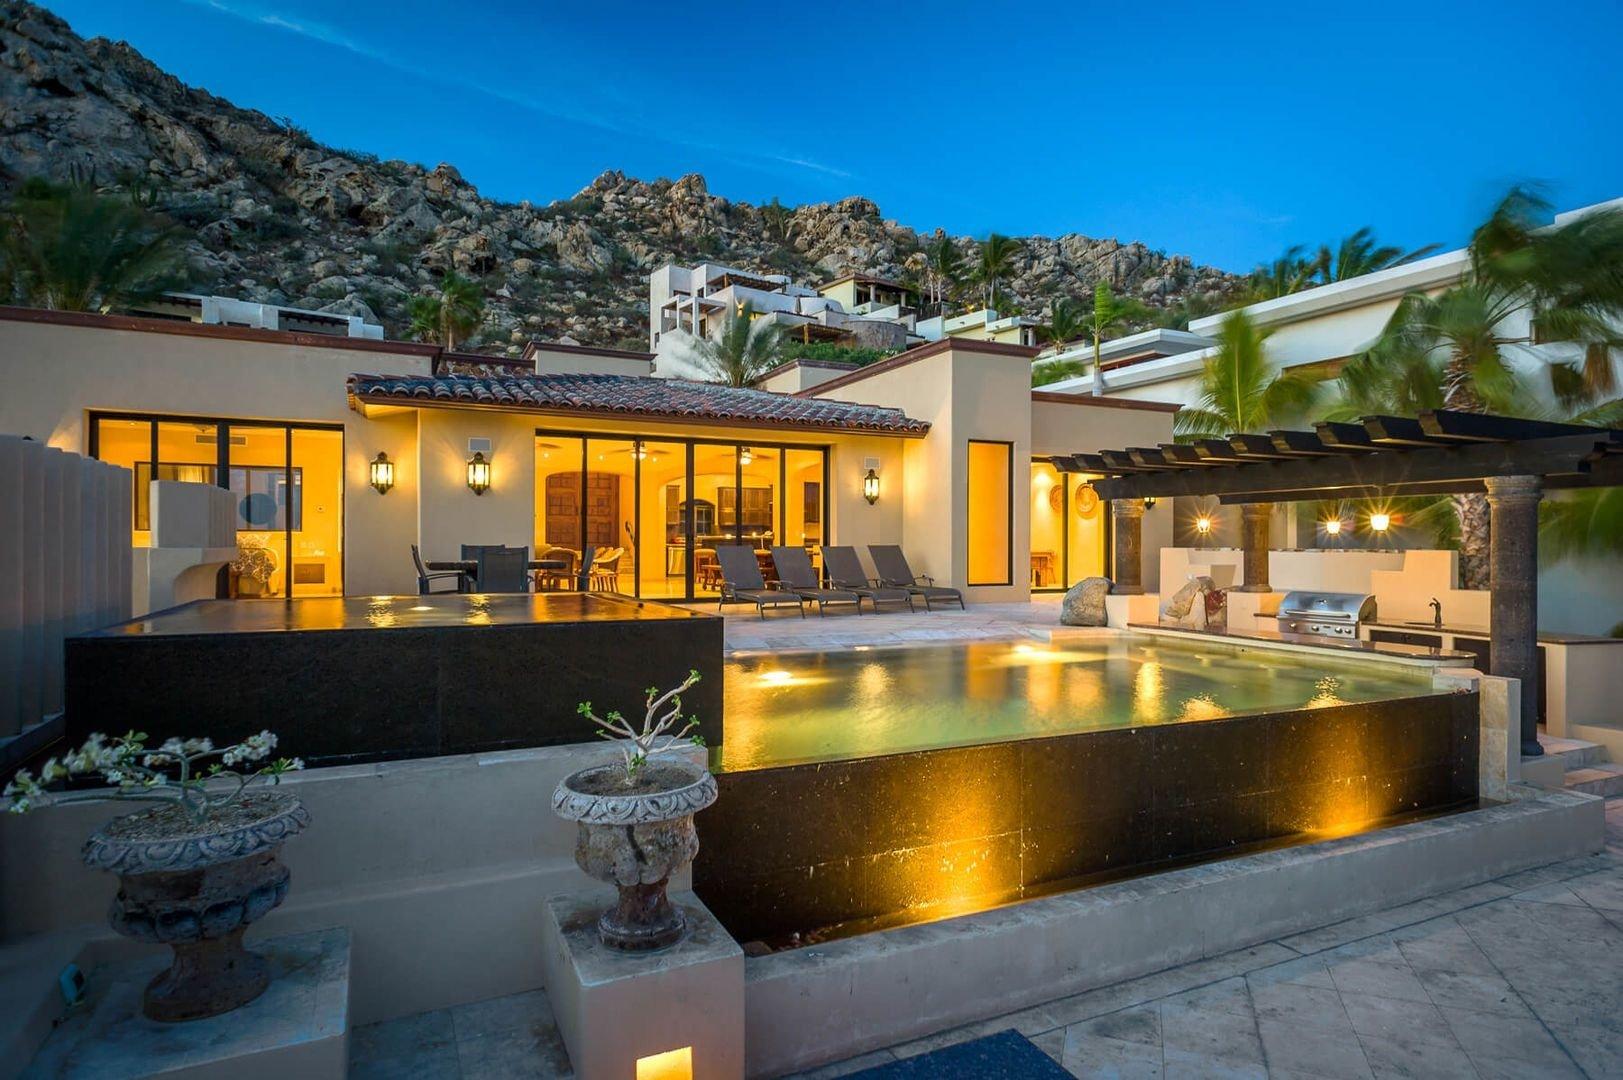 - Villa Gran Vista - Image 1/25